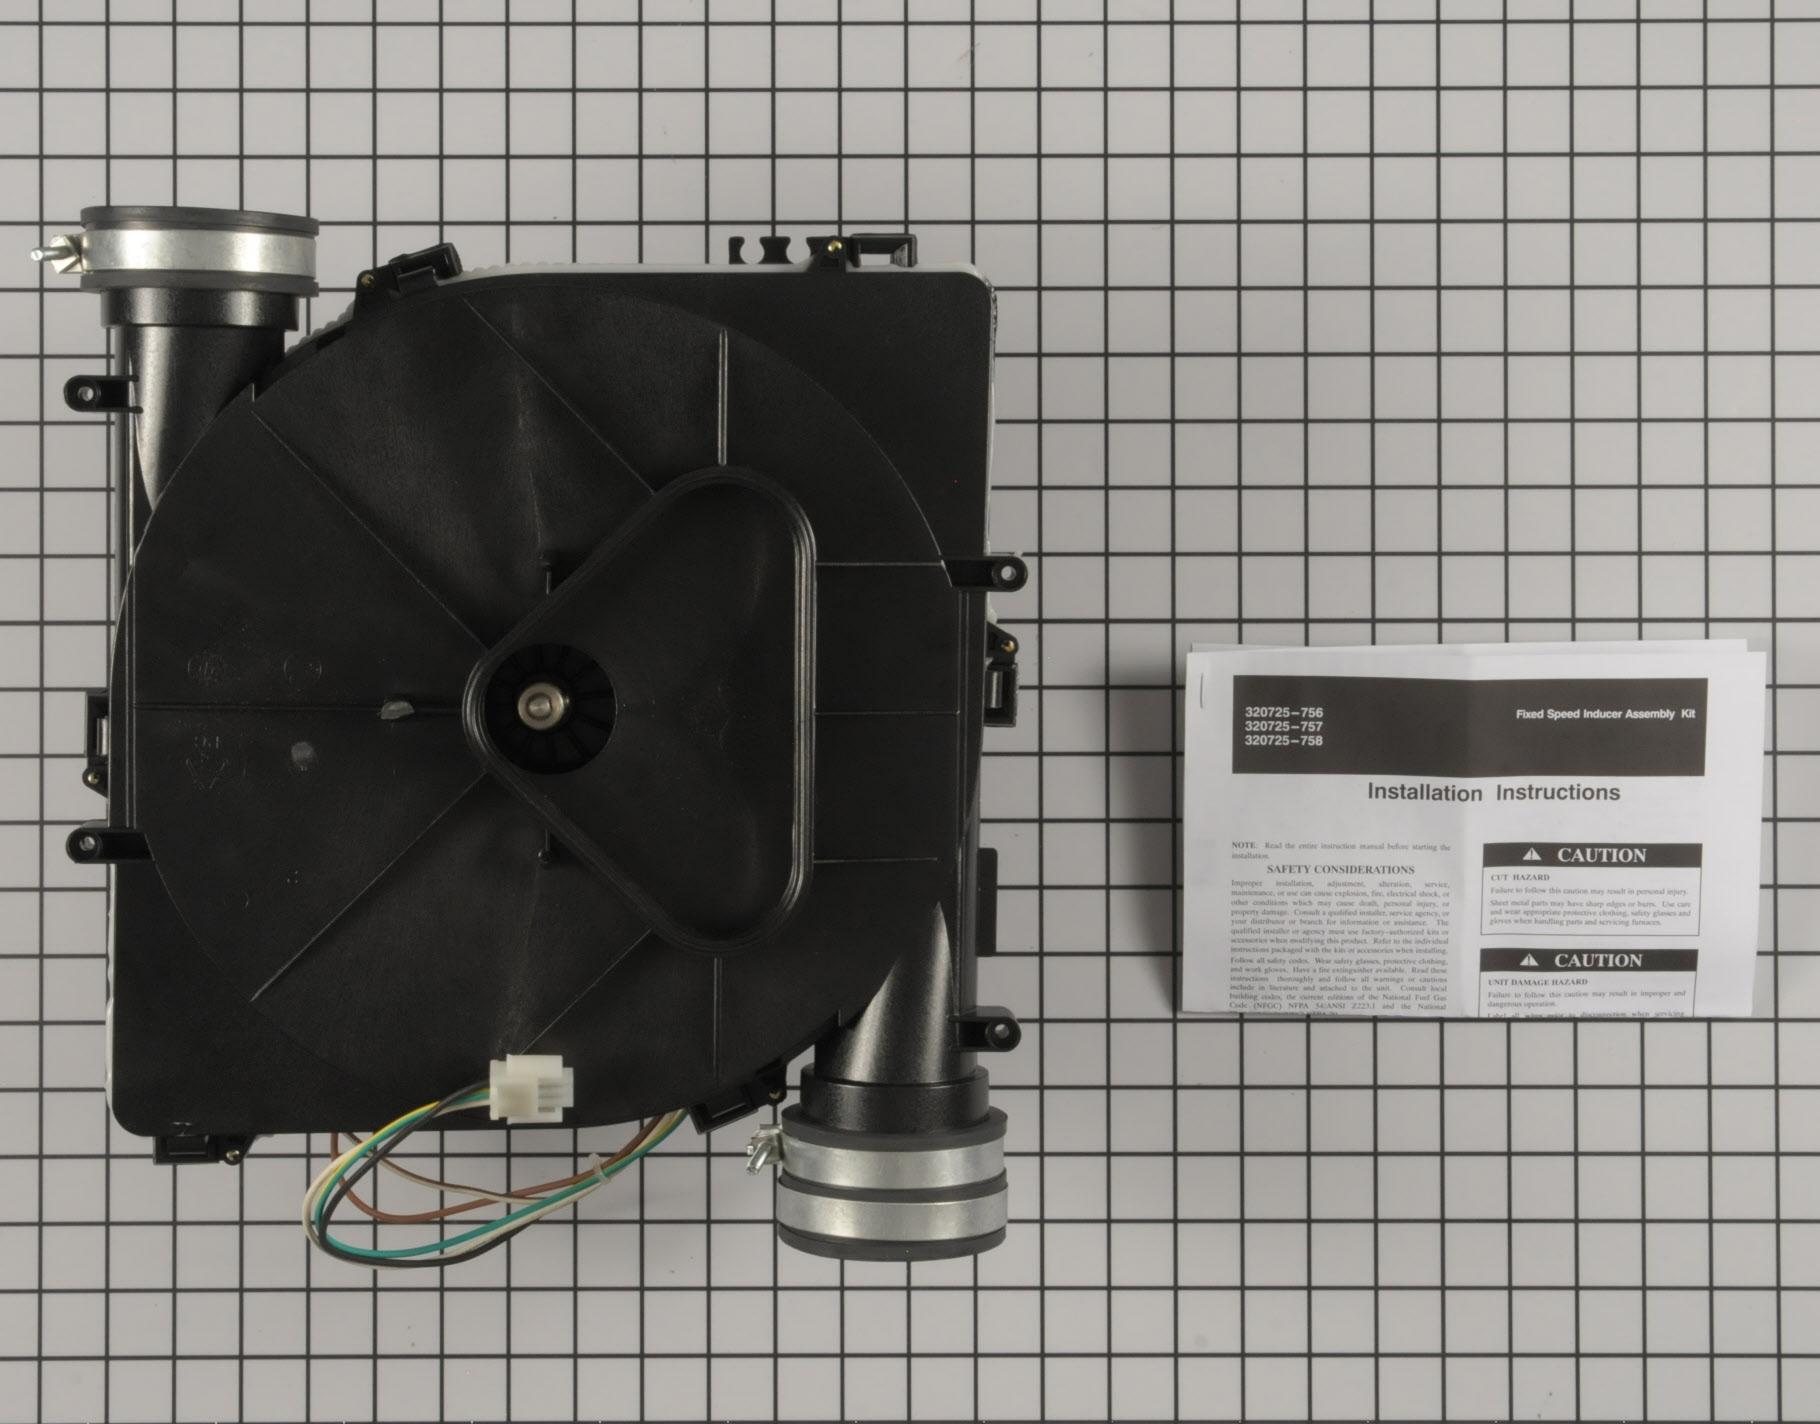 Carrier 320725 756 Furnace Part Draft Inducer Motor